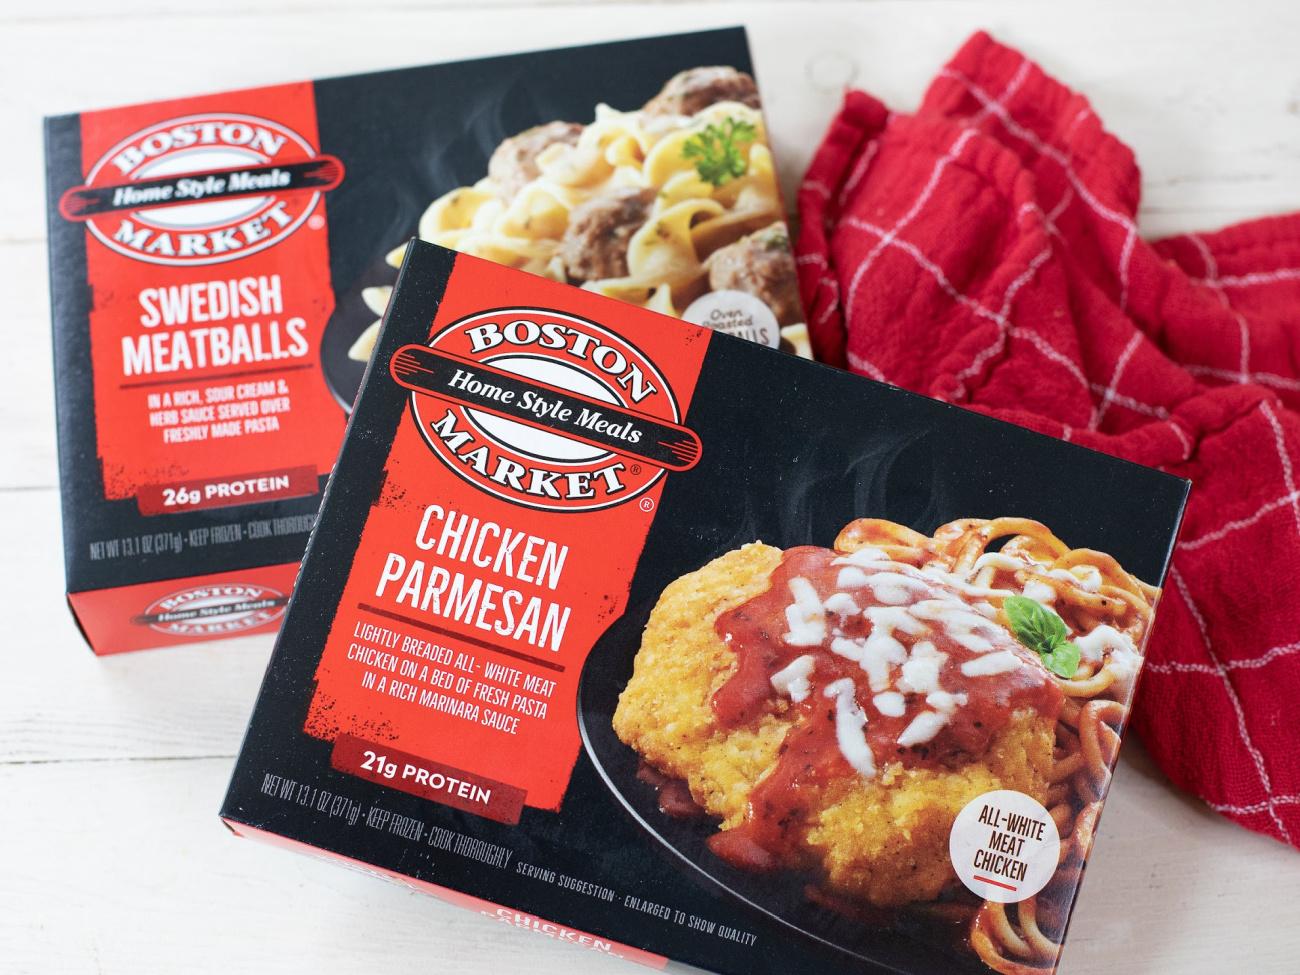 Boston Market Home Style Meals Just 85¢ At Publix on I Heart Publix 1